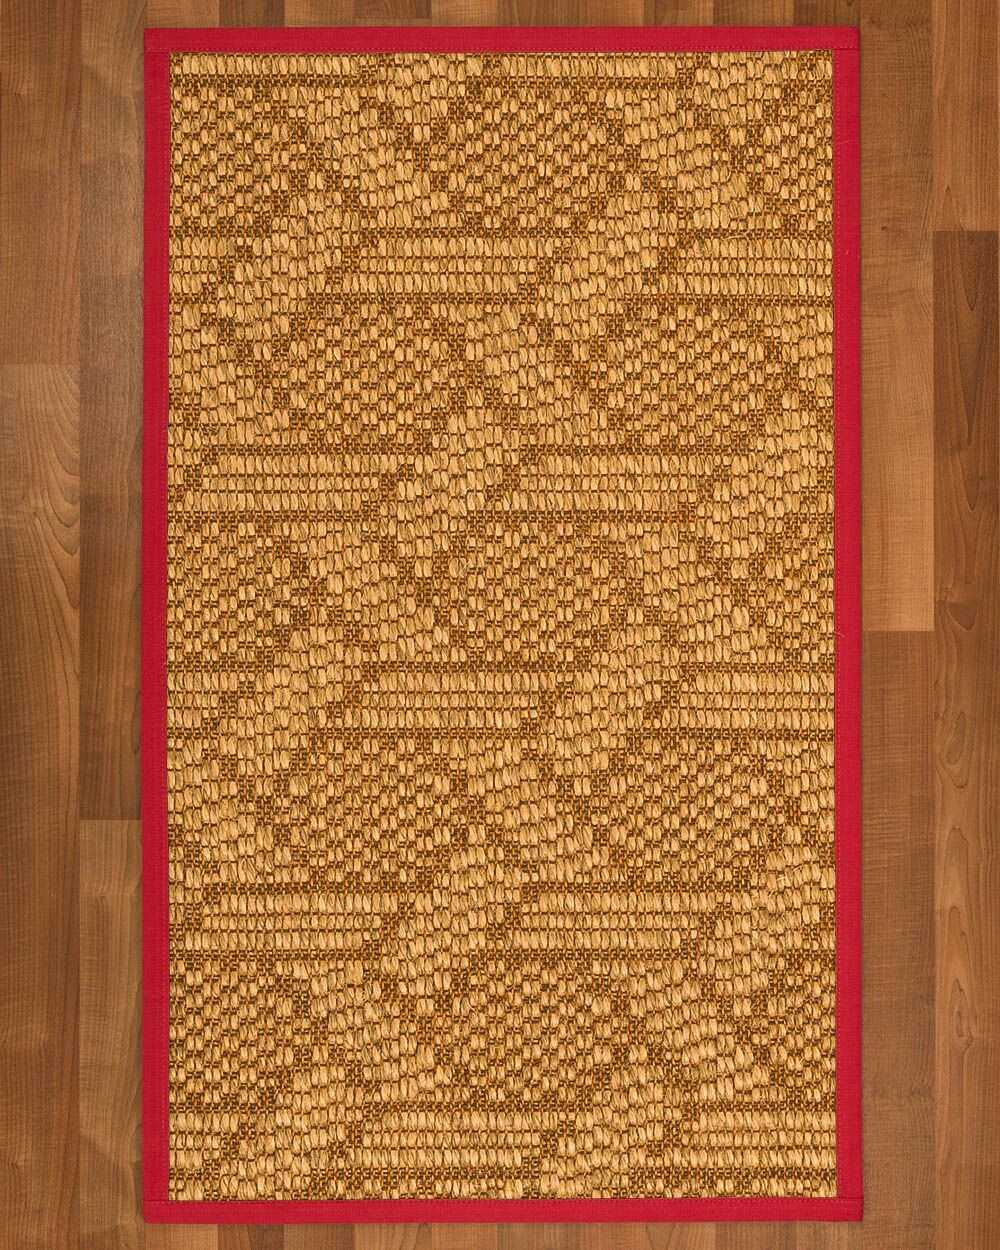 Aalin Hand-Woven Beige Area Rug Rug Size: Rectangle 3' X 5'